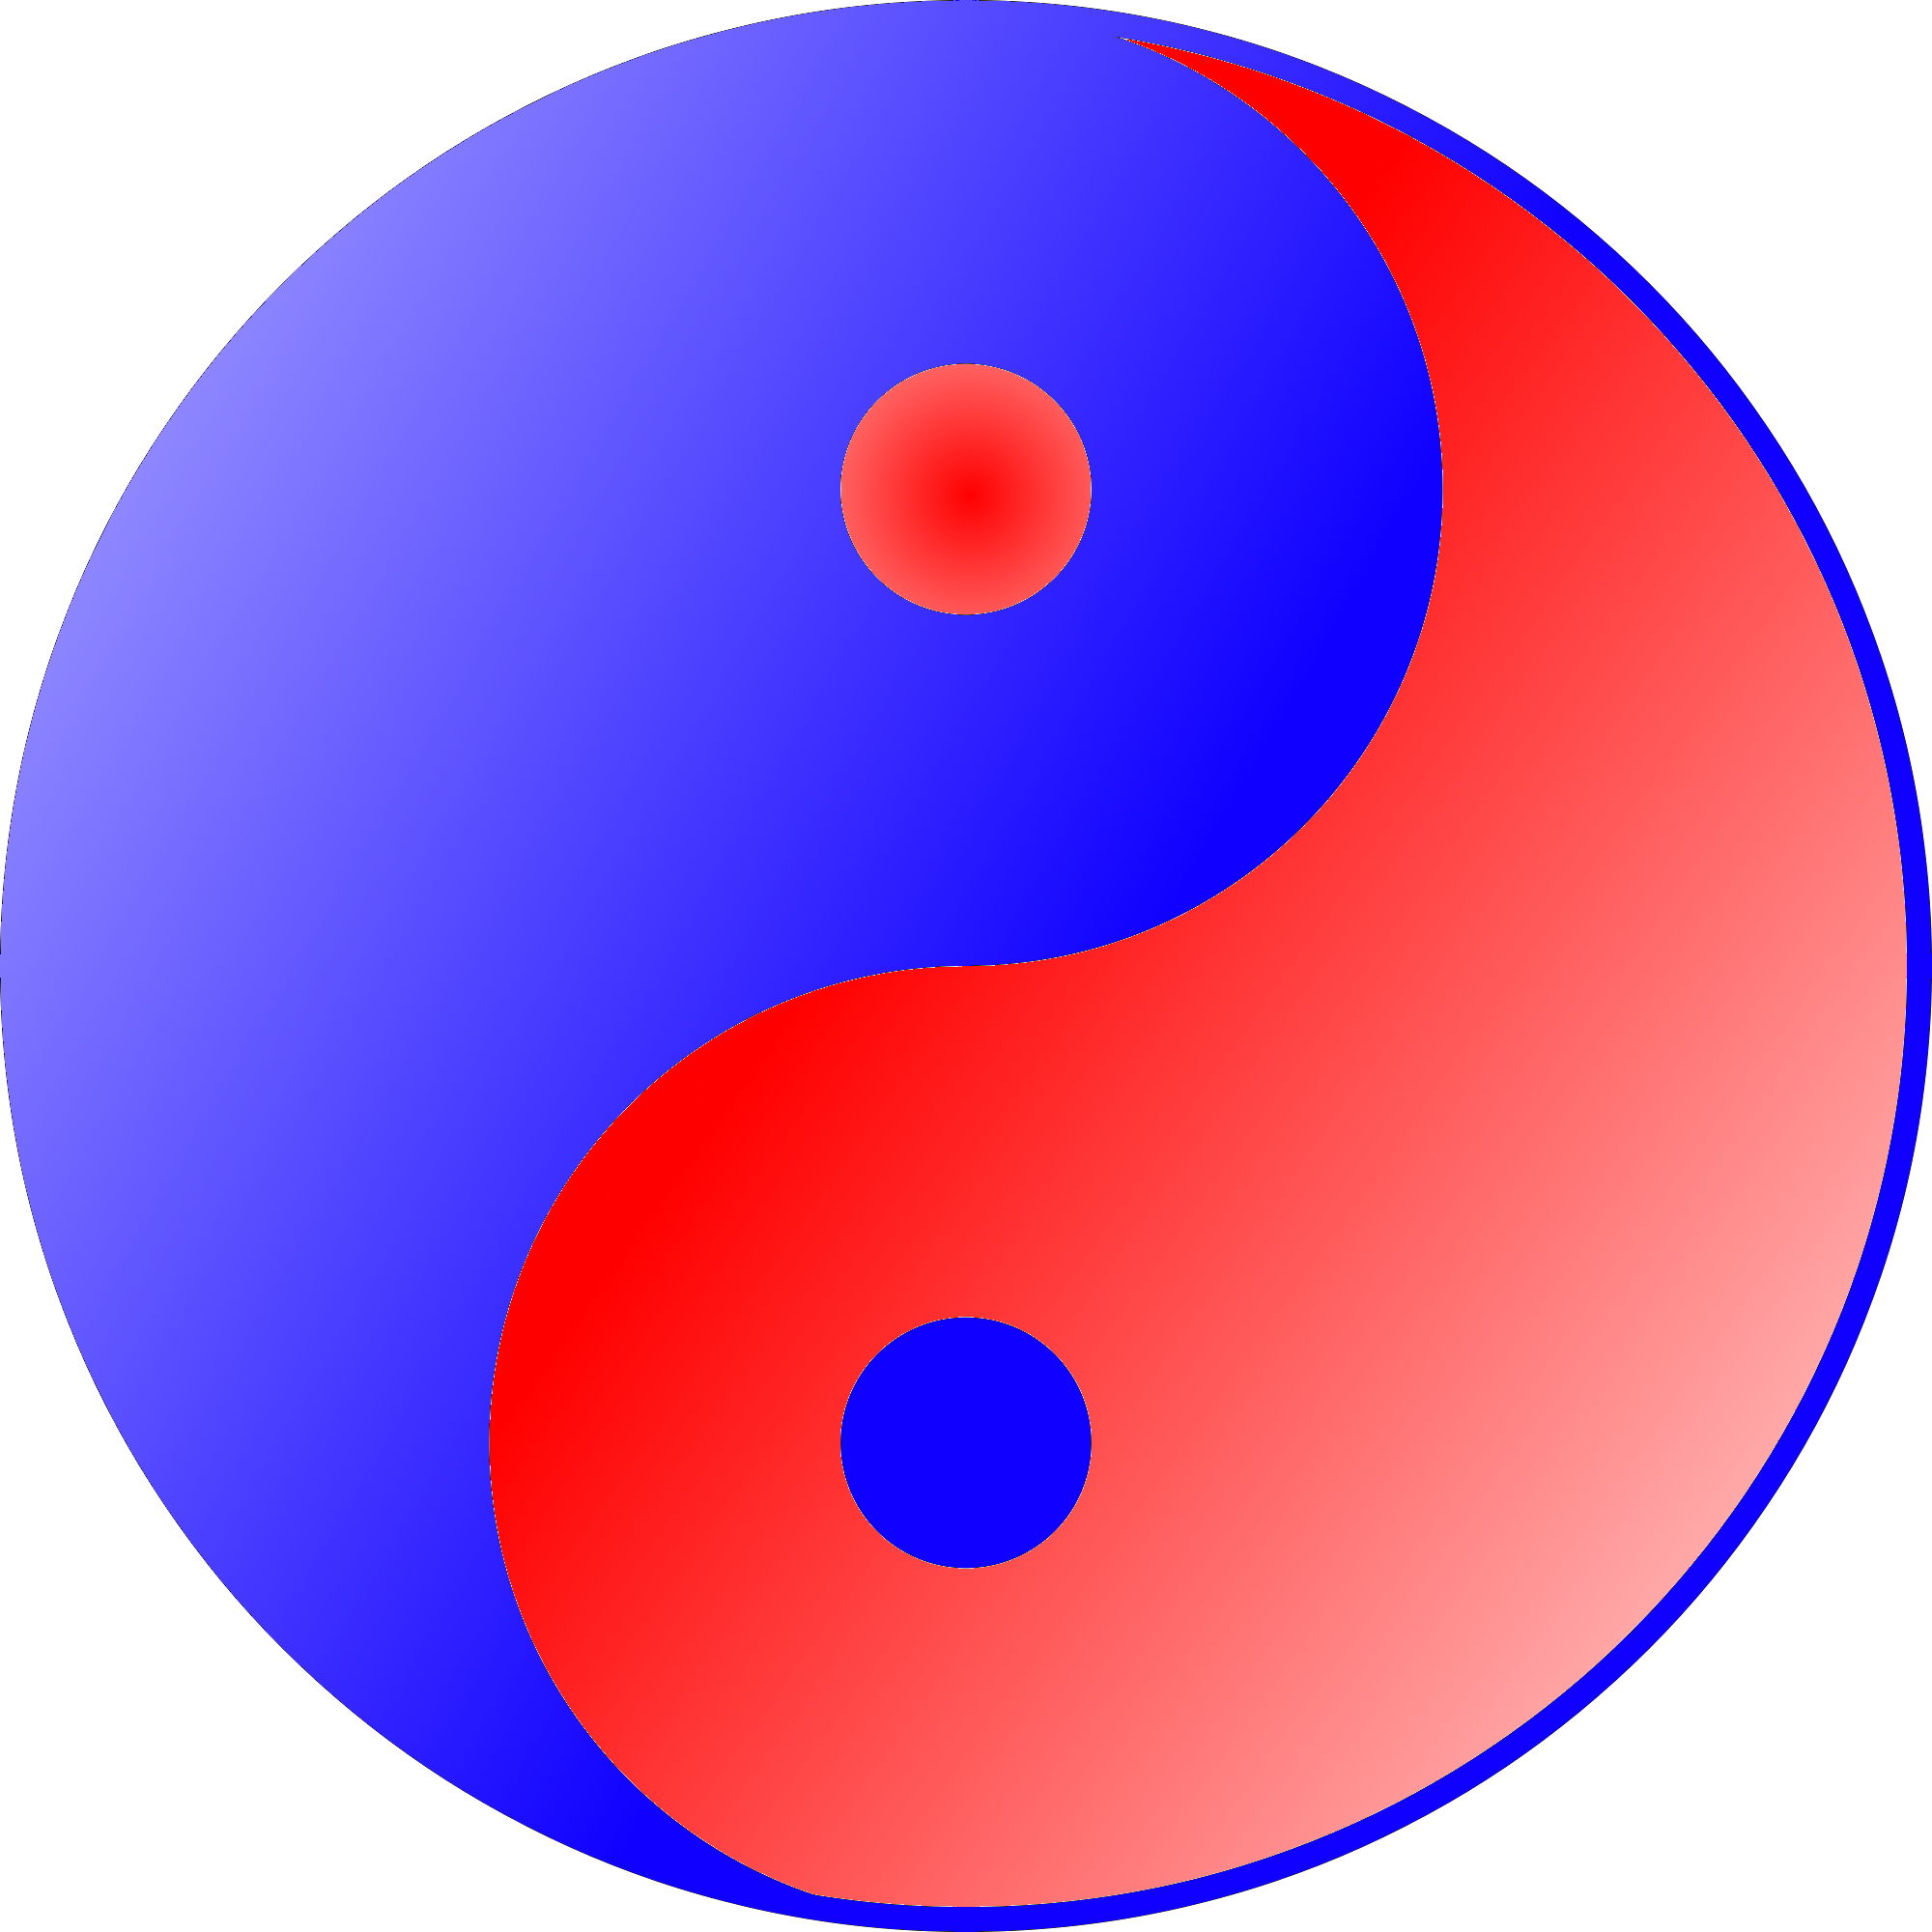 Blue Red Ying Yang